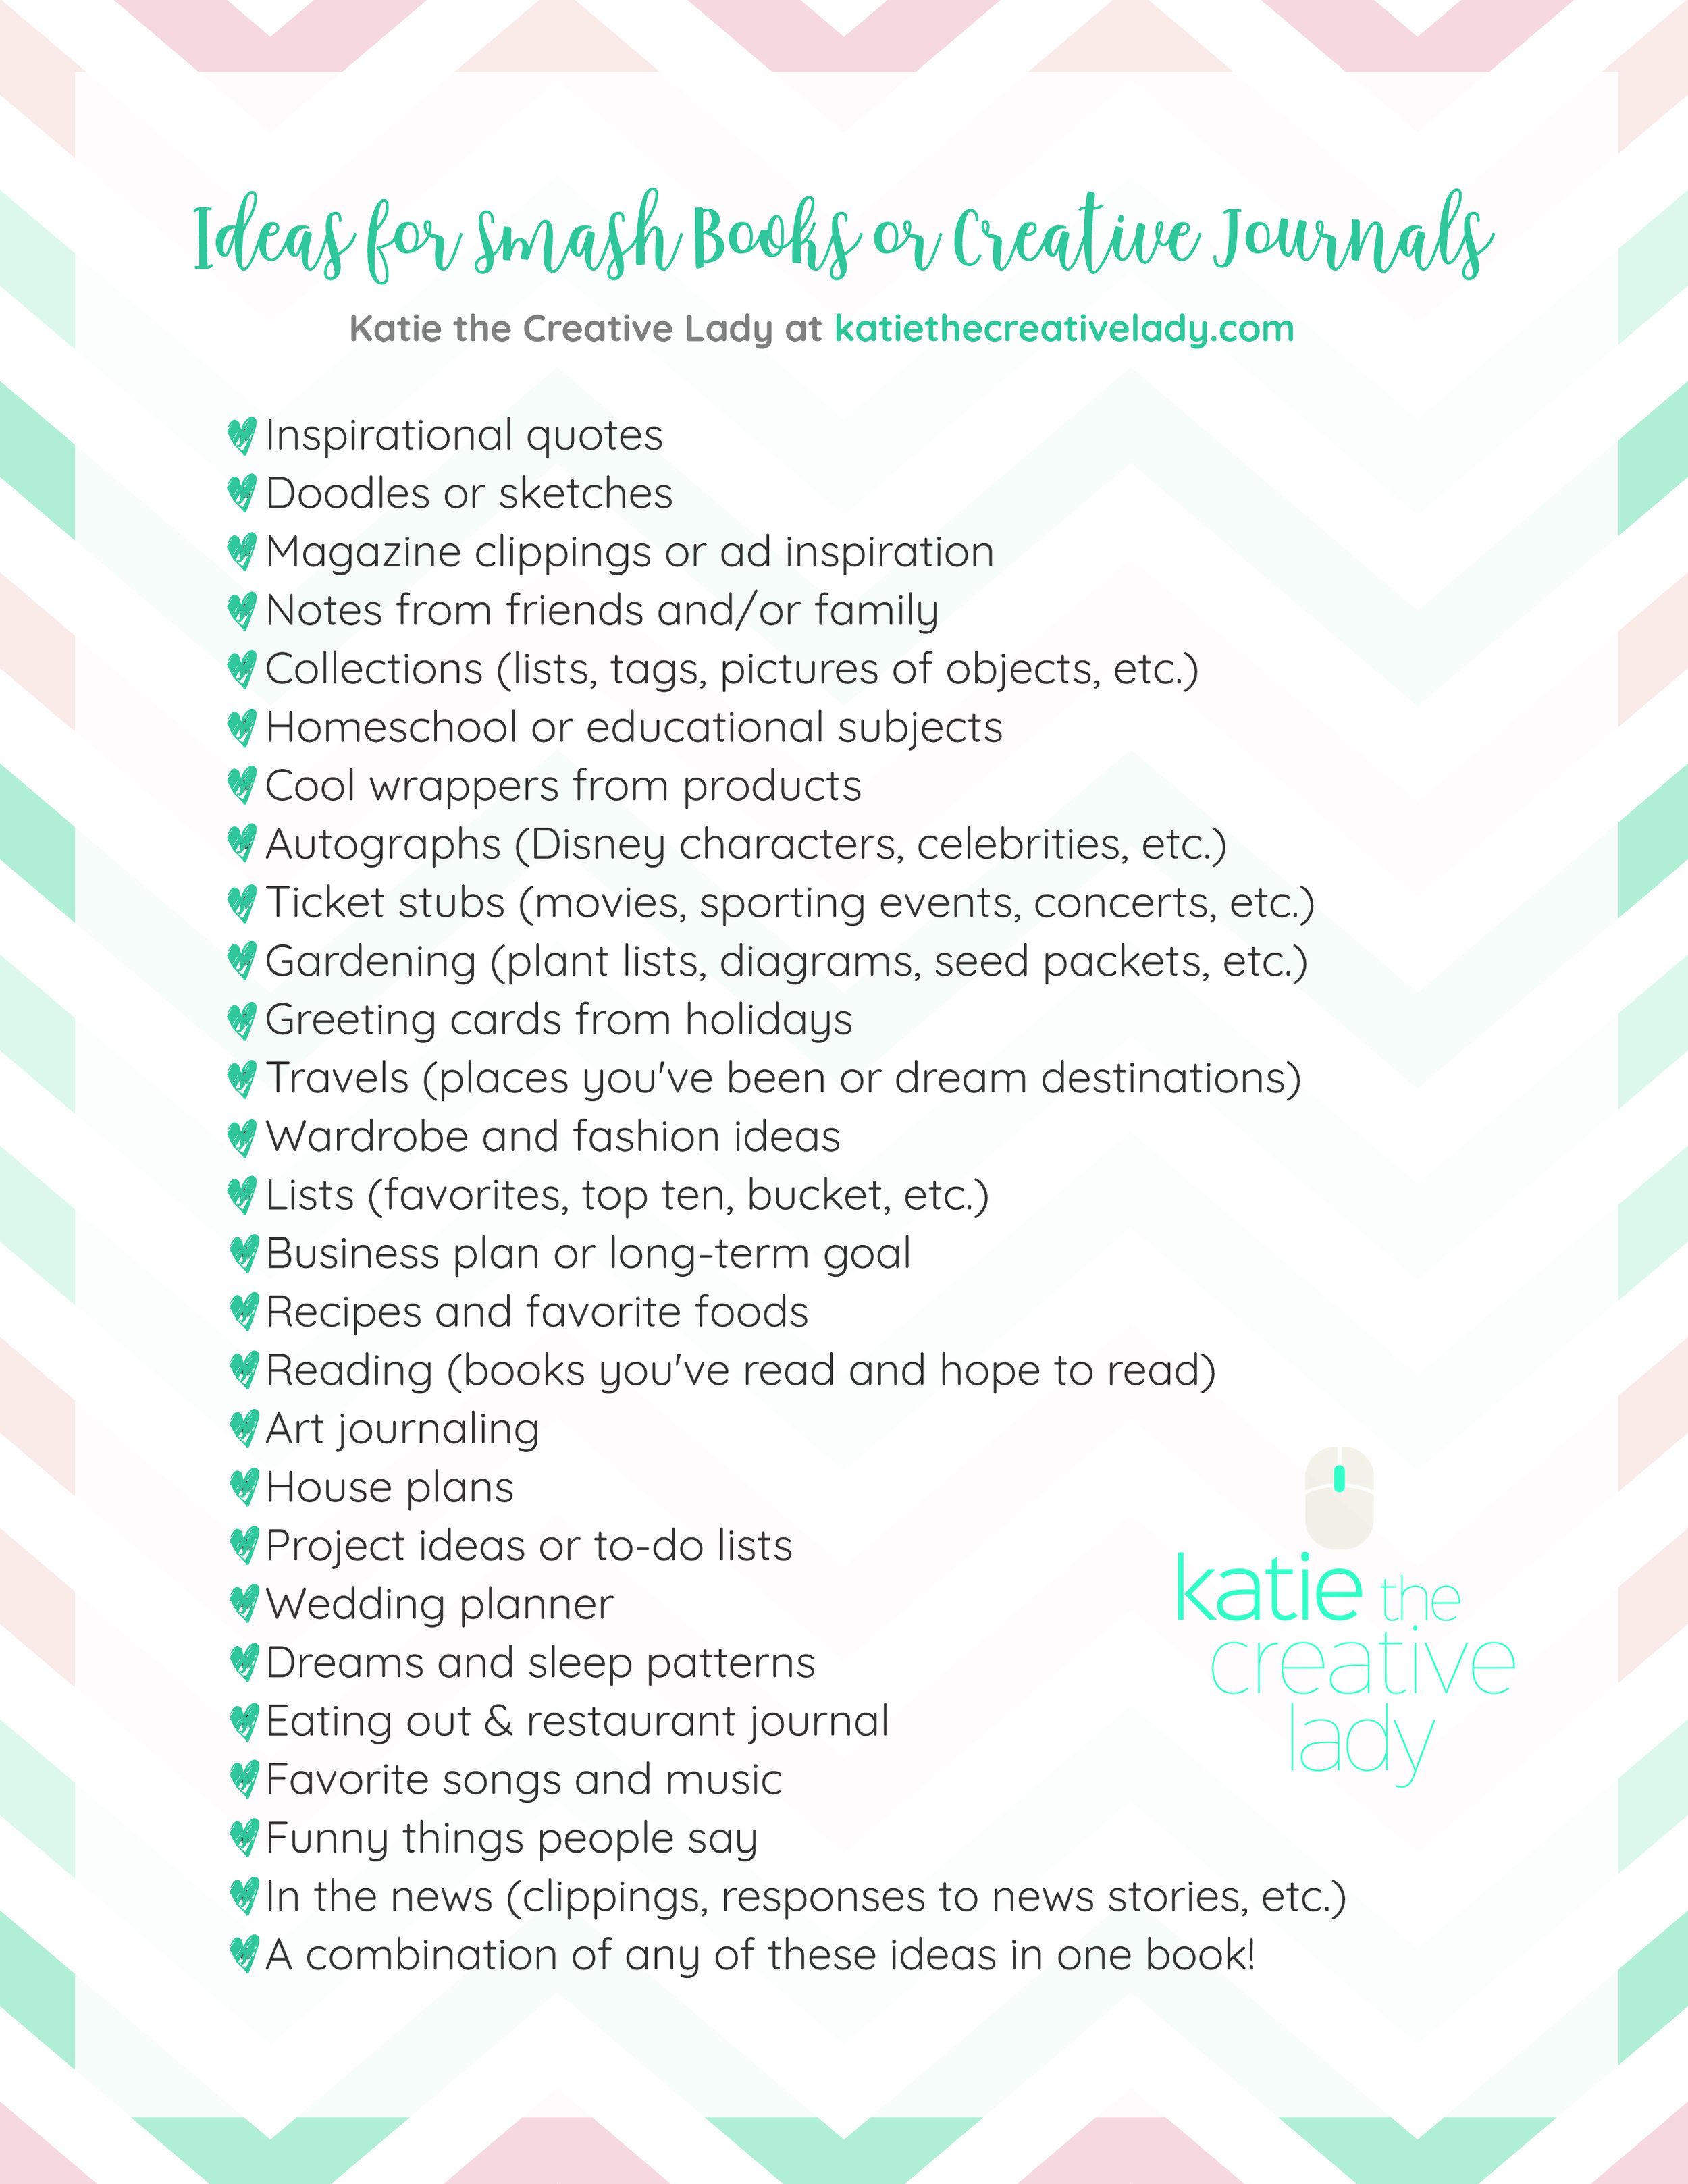 Smash Book Ideas Katie the Creative Lady.jpg